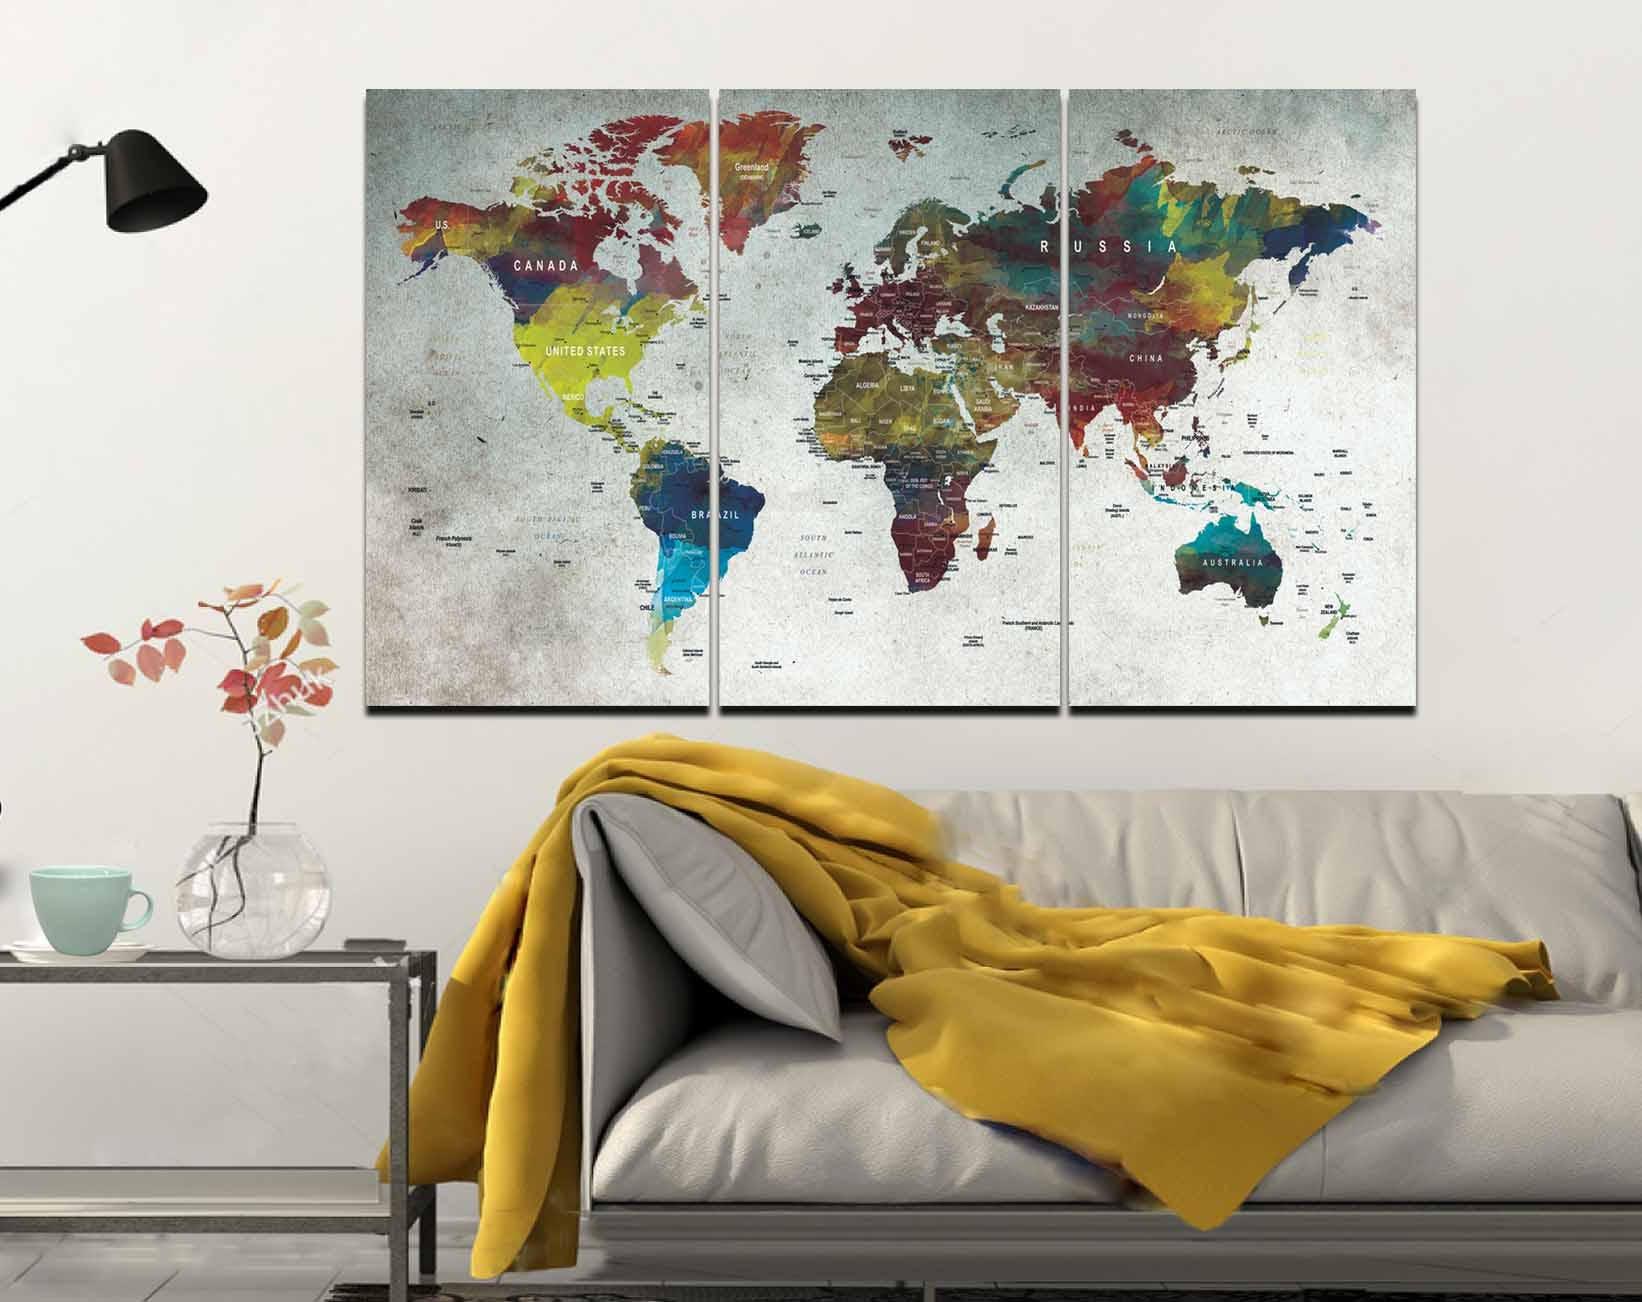 World mapmapwall artlarge world mappush pin mapabstract world world mapmapwall artlarge world mappush pin mapabstract world mappush pin map canvasdecorative canvas artworld travel mapmap canvas gumiabroncs Images